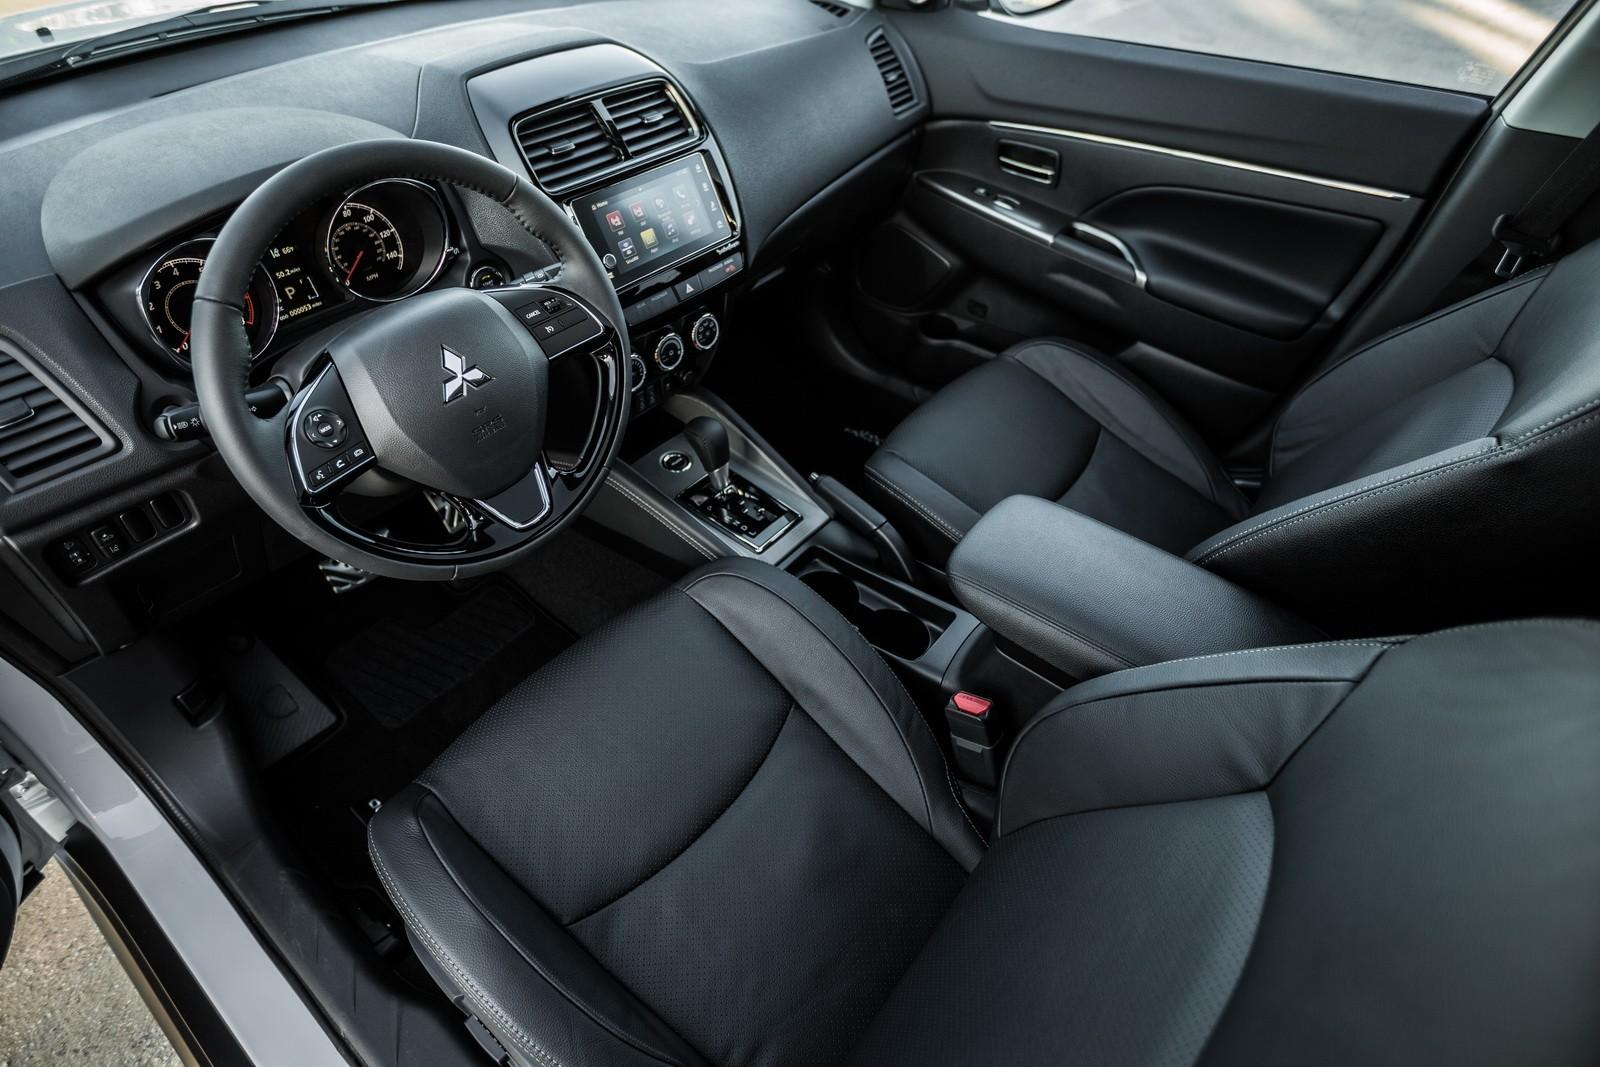 Five Star Auto Sales >> 2018 Mitsubishi Outlander Sport Debuts With Subtle Updates - autoevolution